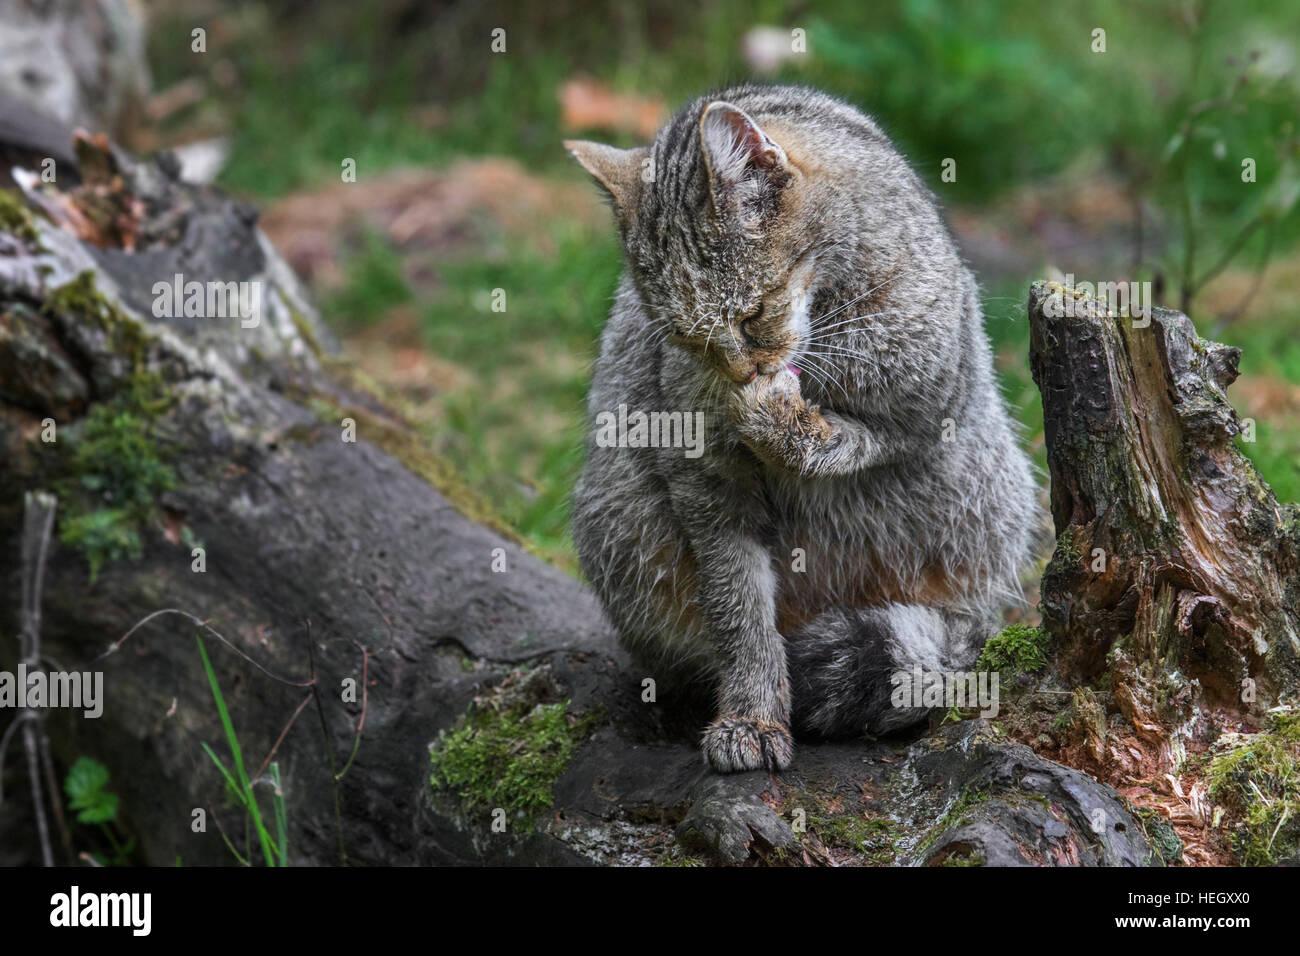 European wildcat (Felis silvestris silvestris) licking forepaw in forest - Stock Image